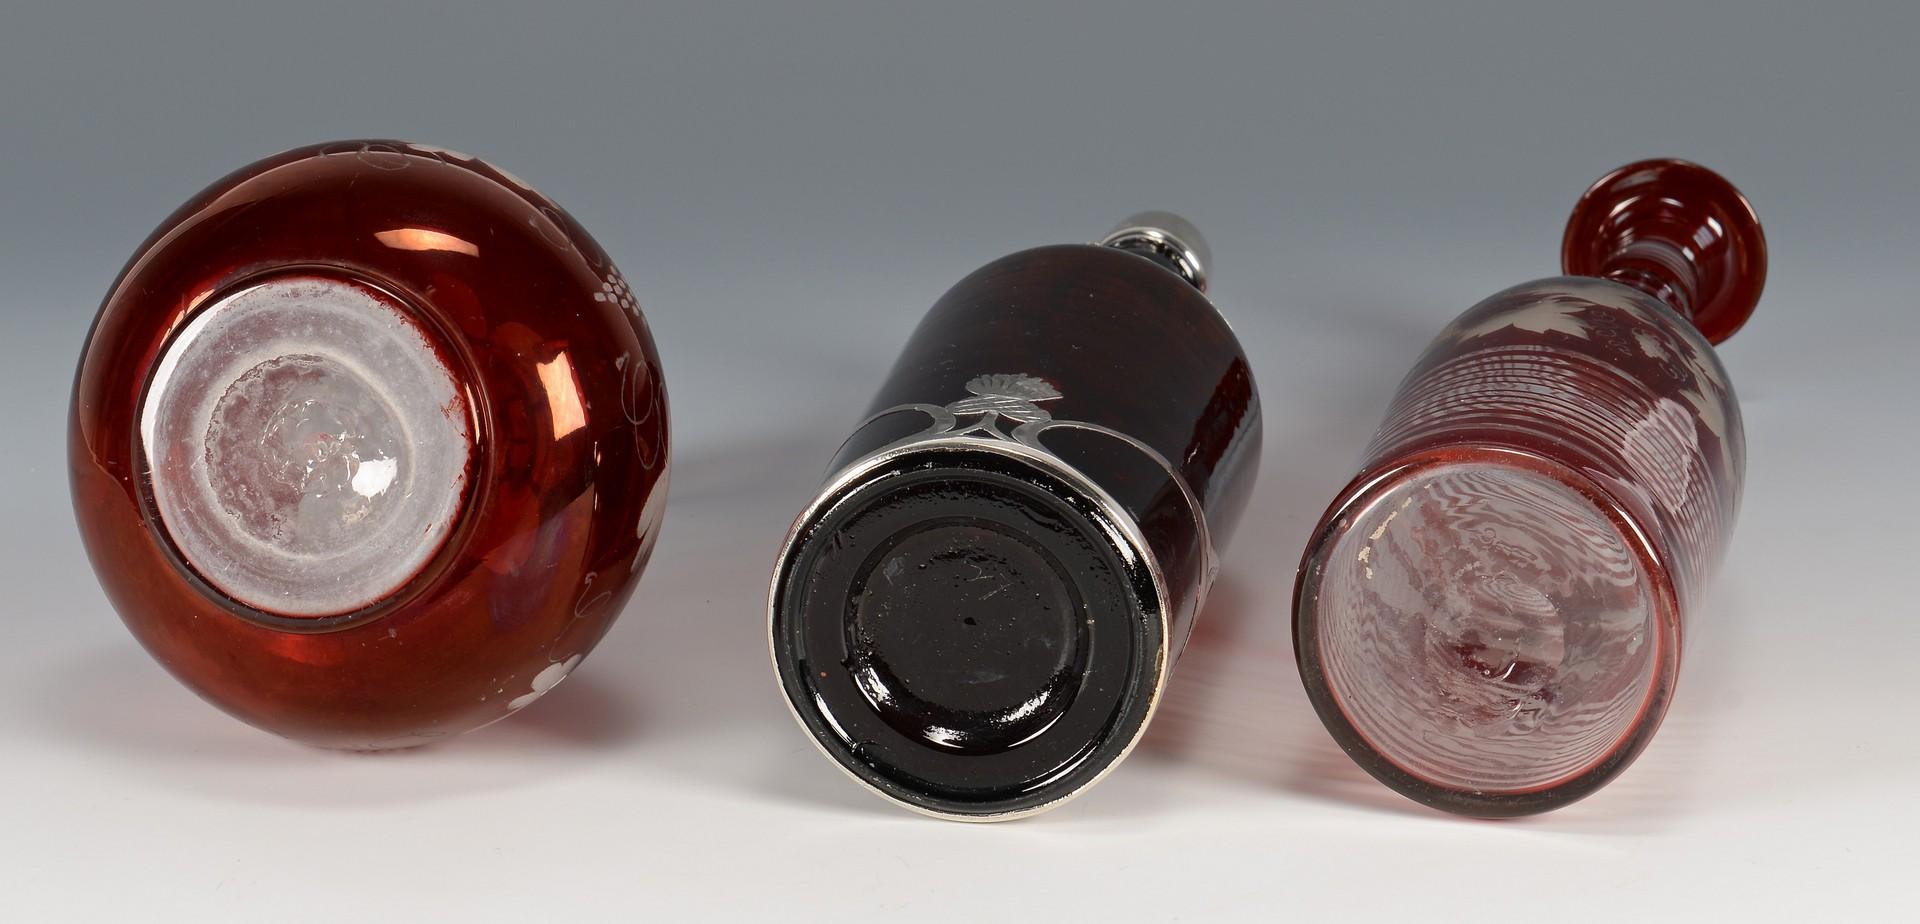 Lot 3832434: 17 pcs assorted glass: Ruby, Amber, Bristol Blue